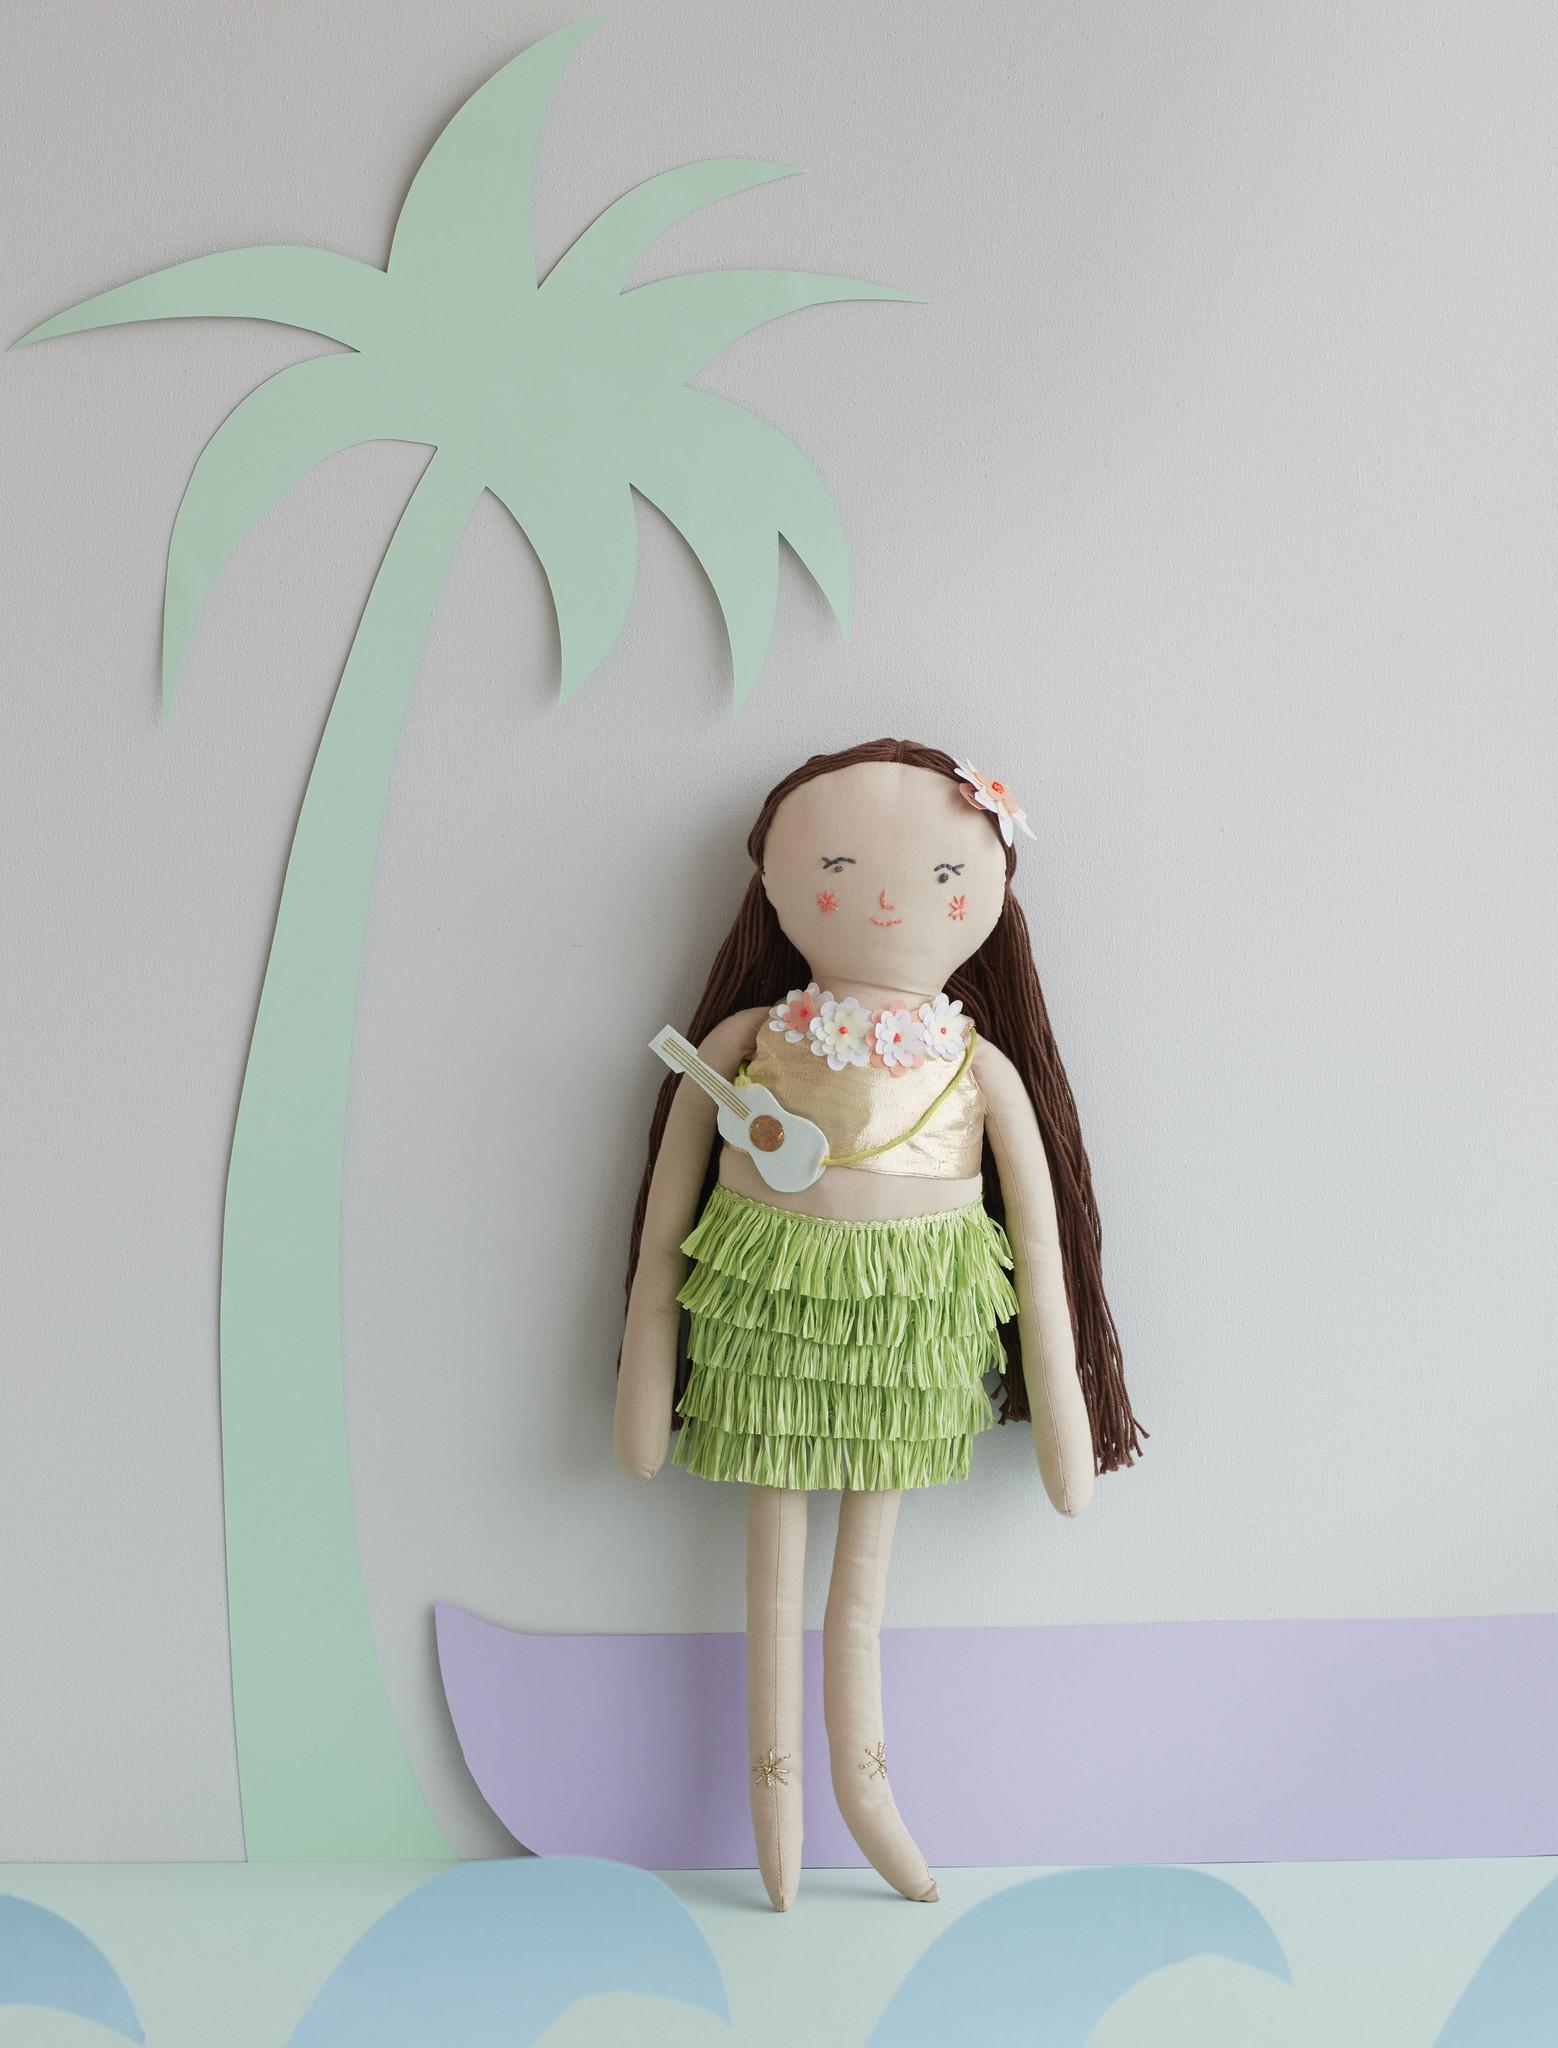 MERIMERI Tallulah hula doll